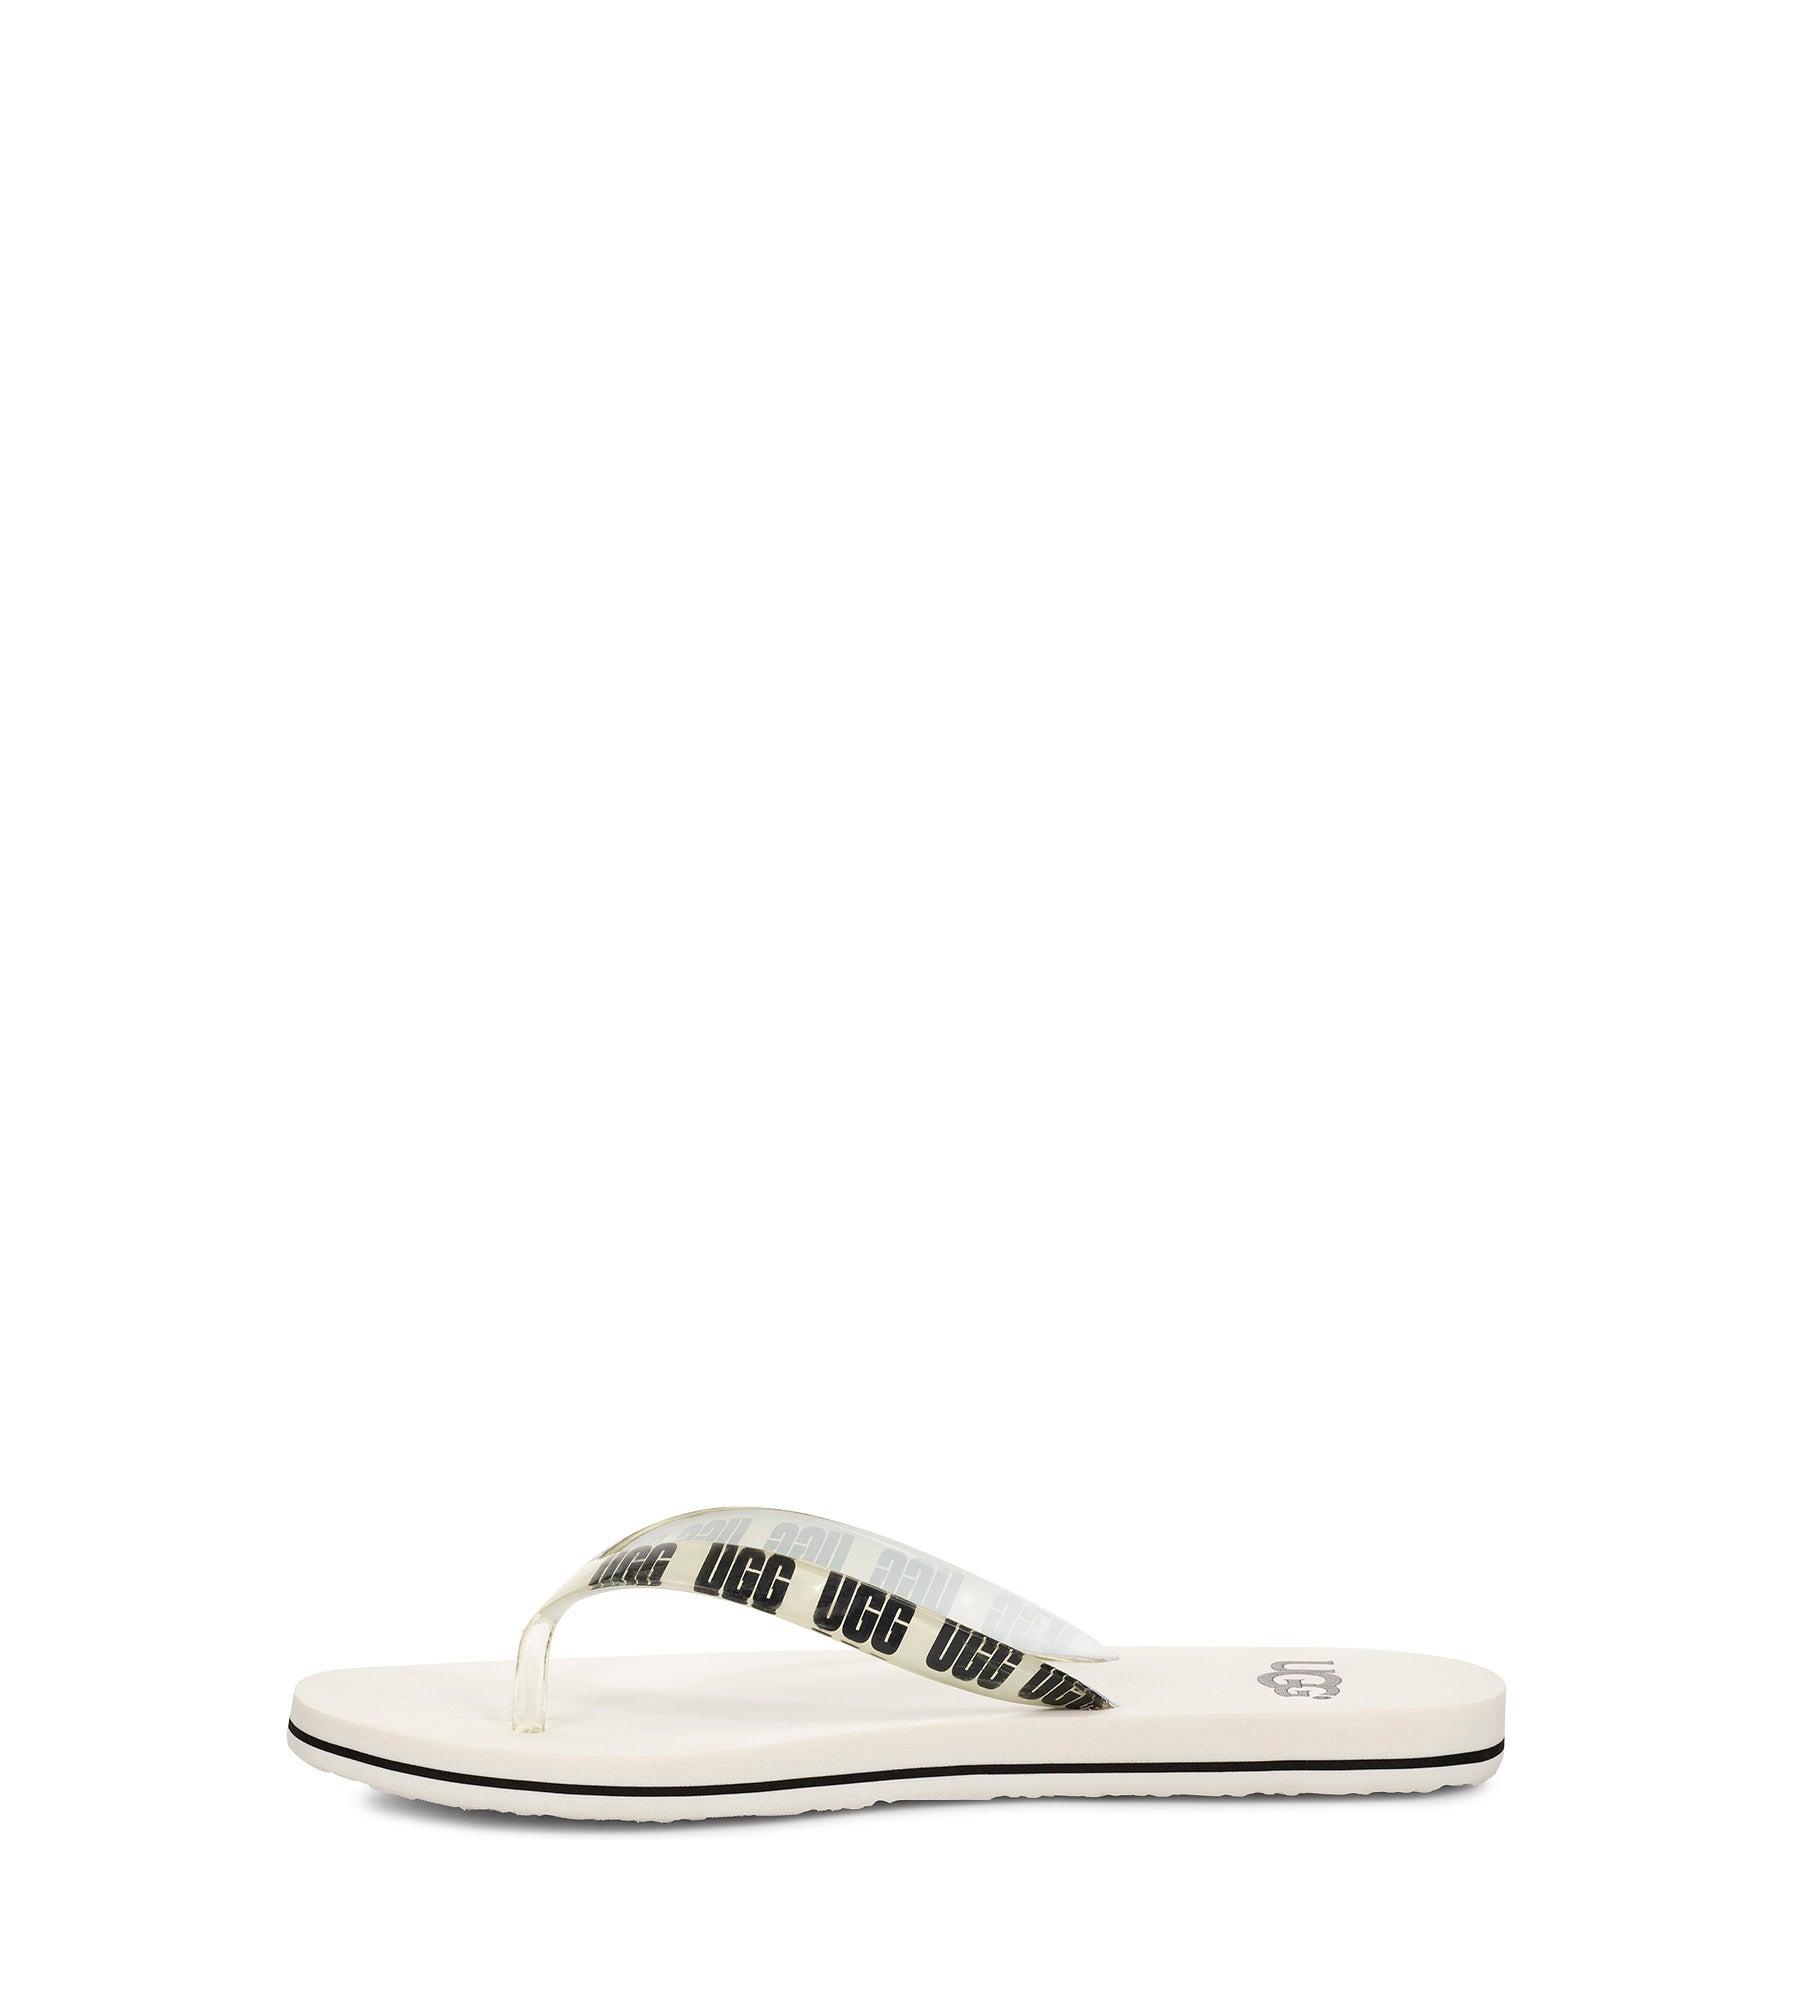 Sandale tong Simi Graphic, blanc, femmes